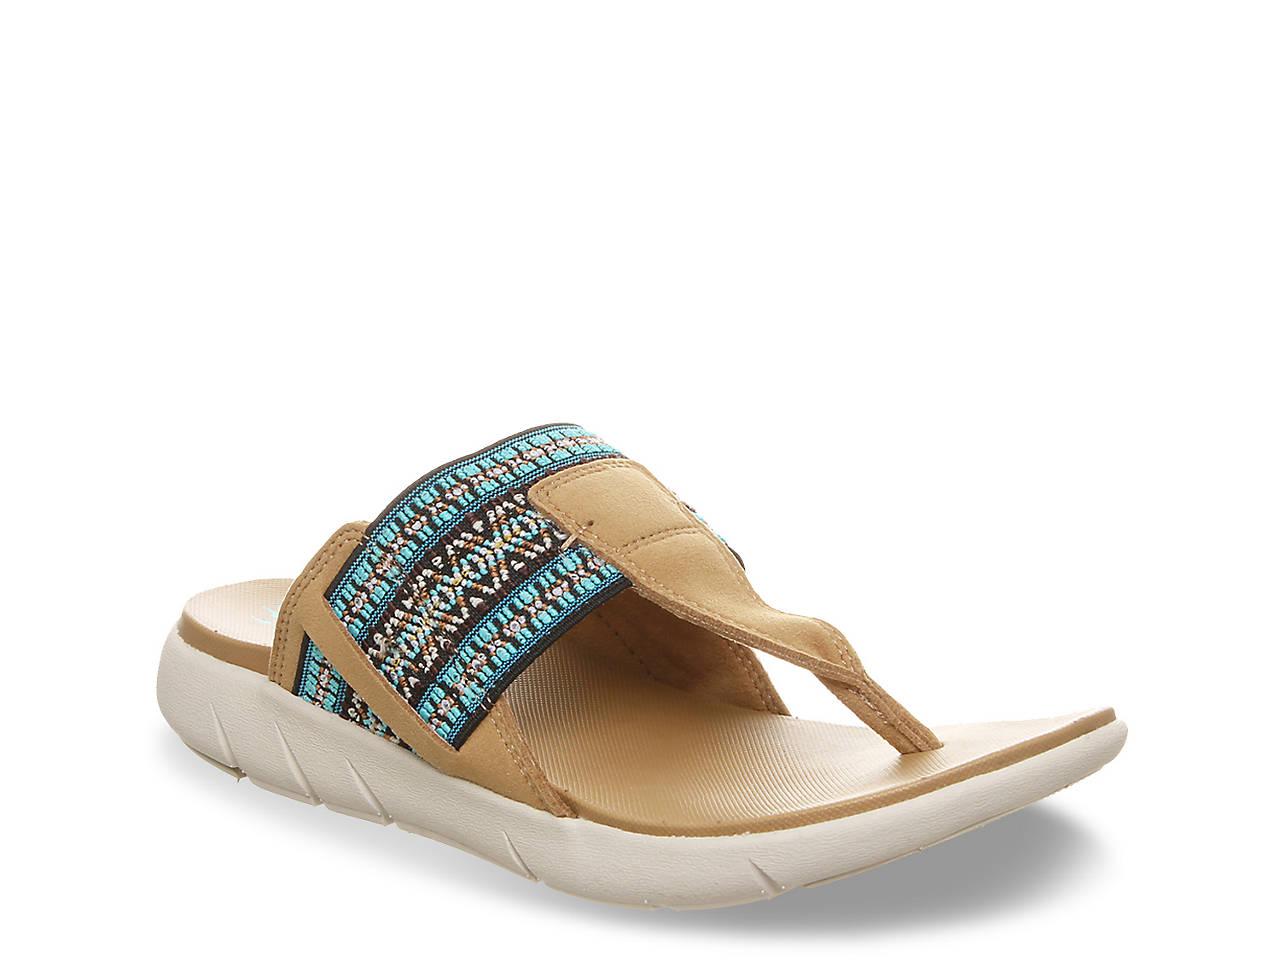 994d080ec1c5 Bearpaw Dakota Sandal Women s Shoes